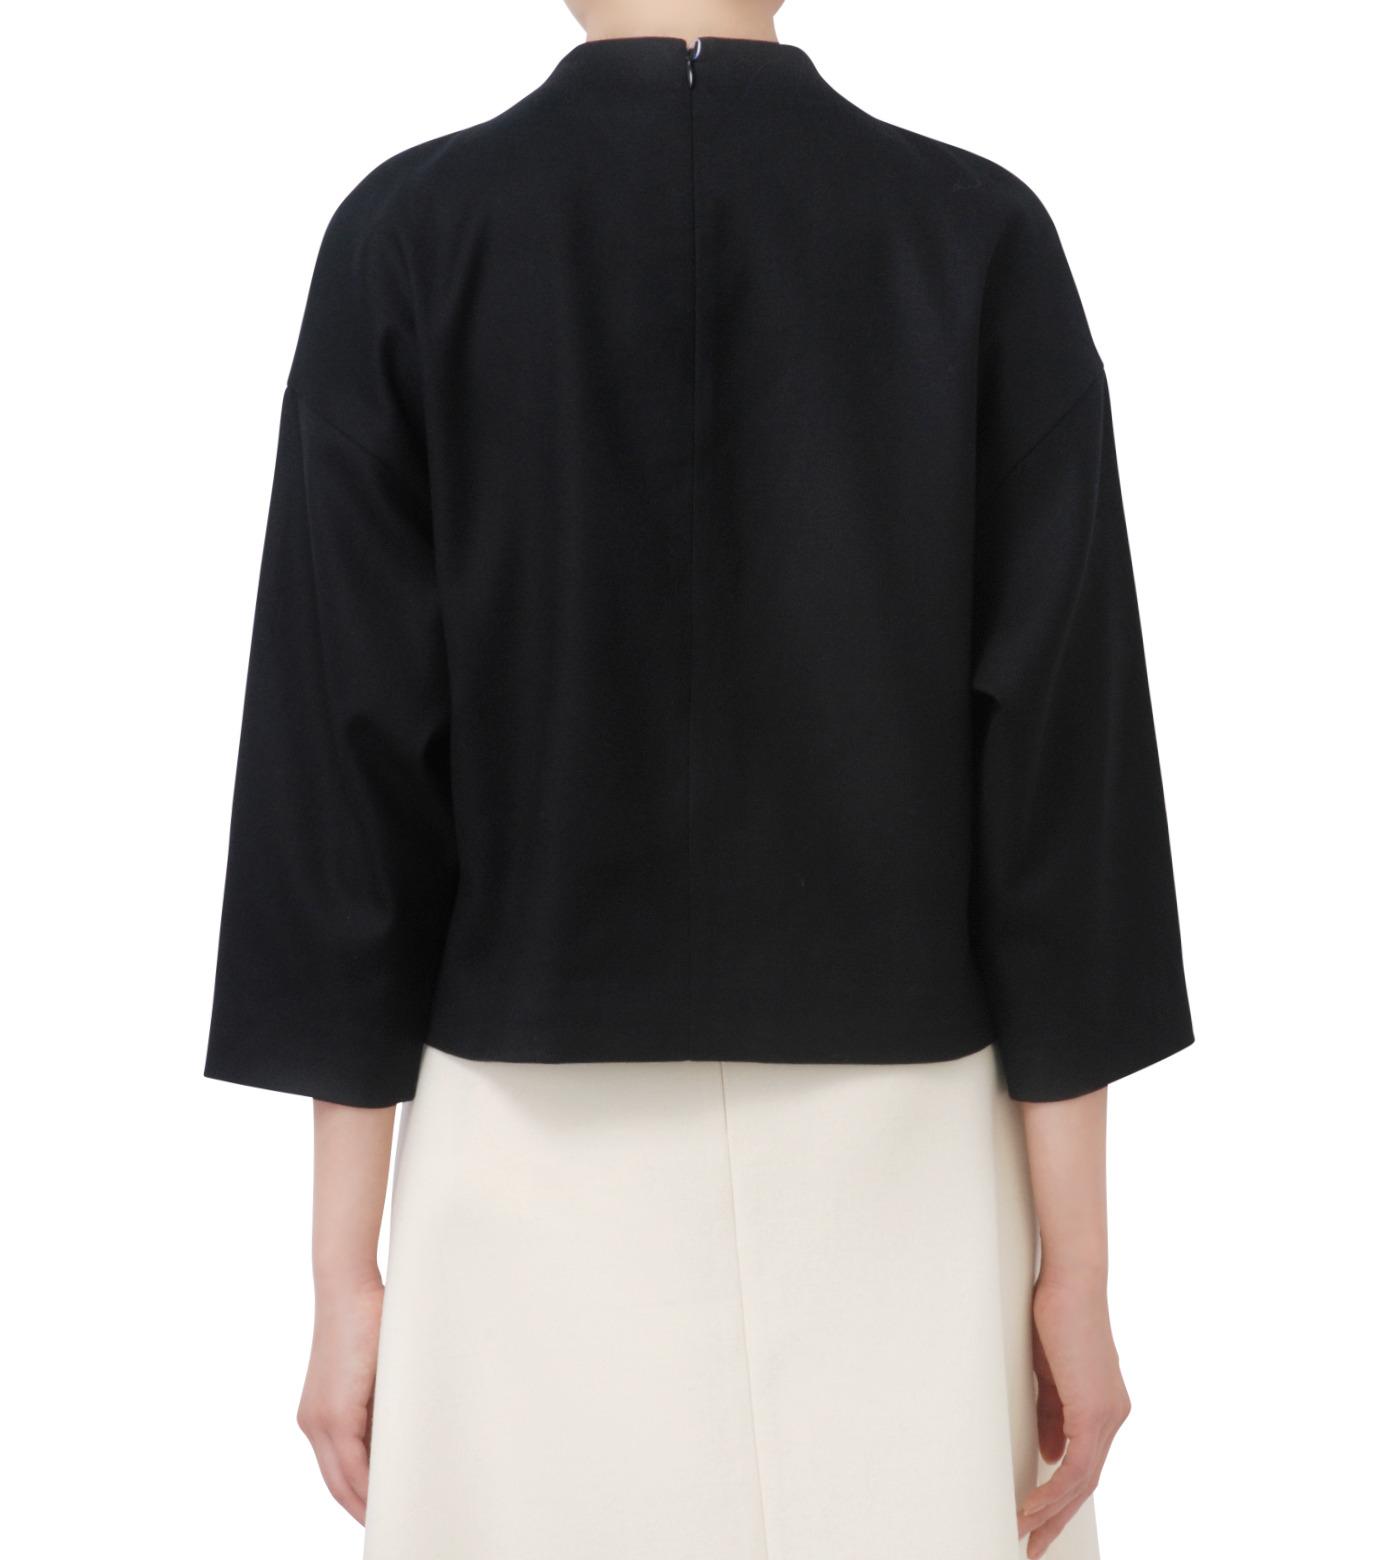 LE CIEL BLEU(ルシェルブルー)のフェイクファーポンポントップス-BLACK(シャツ/shirt)-17A63029 拡大詳細画像3